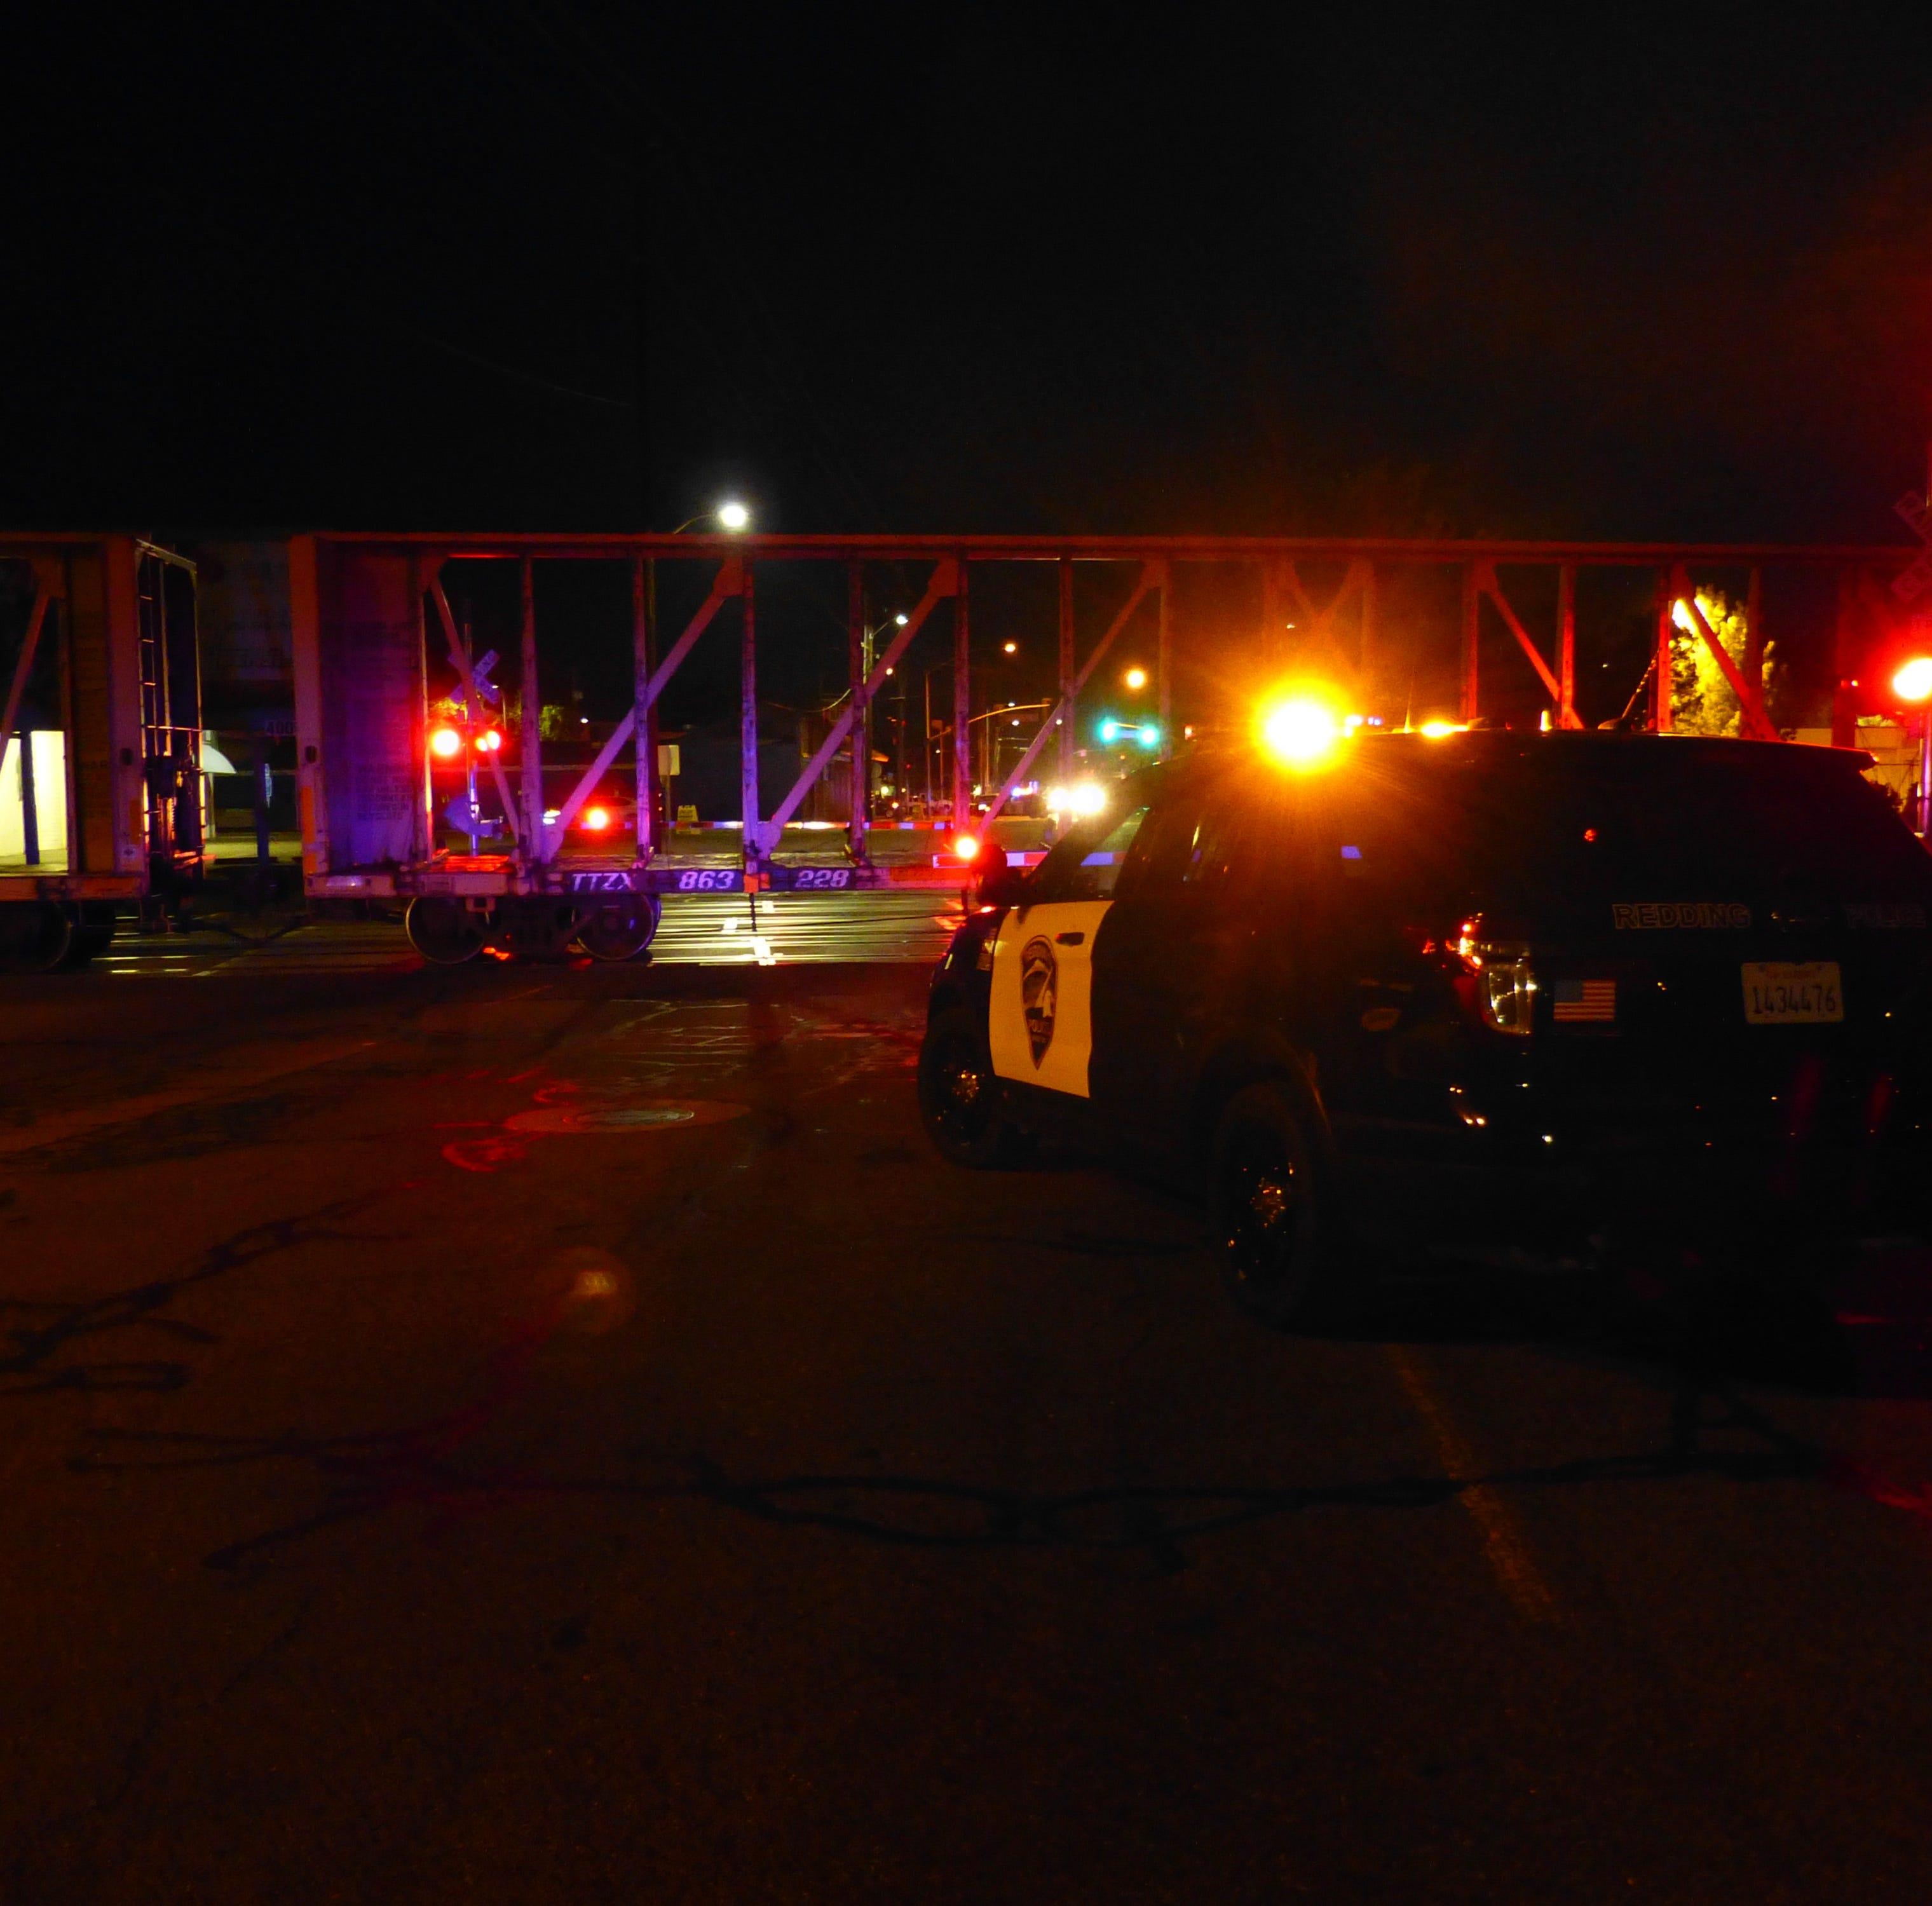 Train strikes, kills pedestrian in Redding